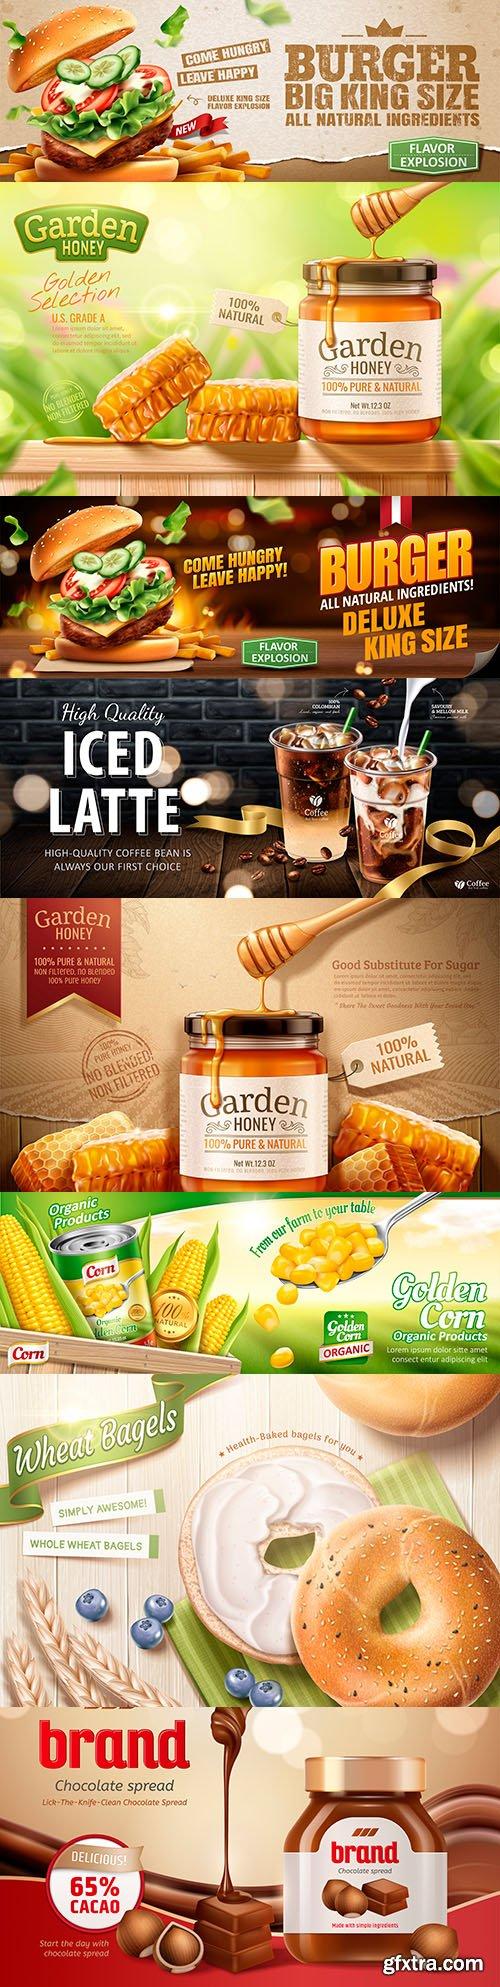 Tasty hamburger, garden honey and coffee advertising banner design